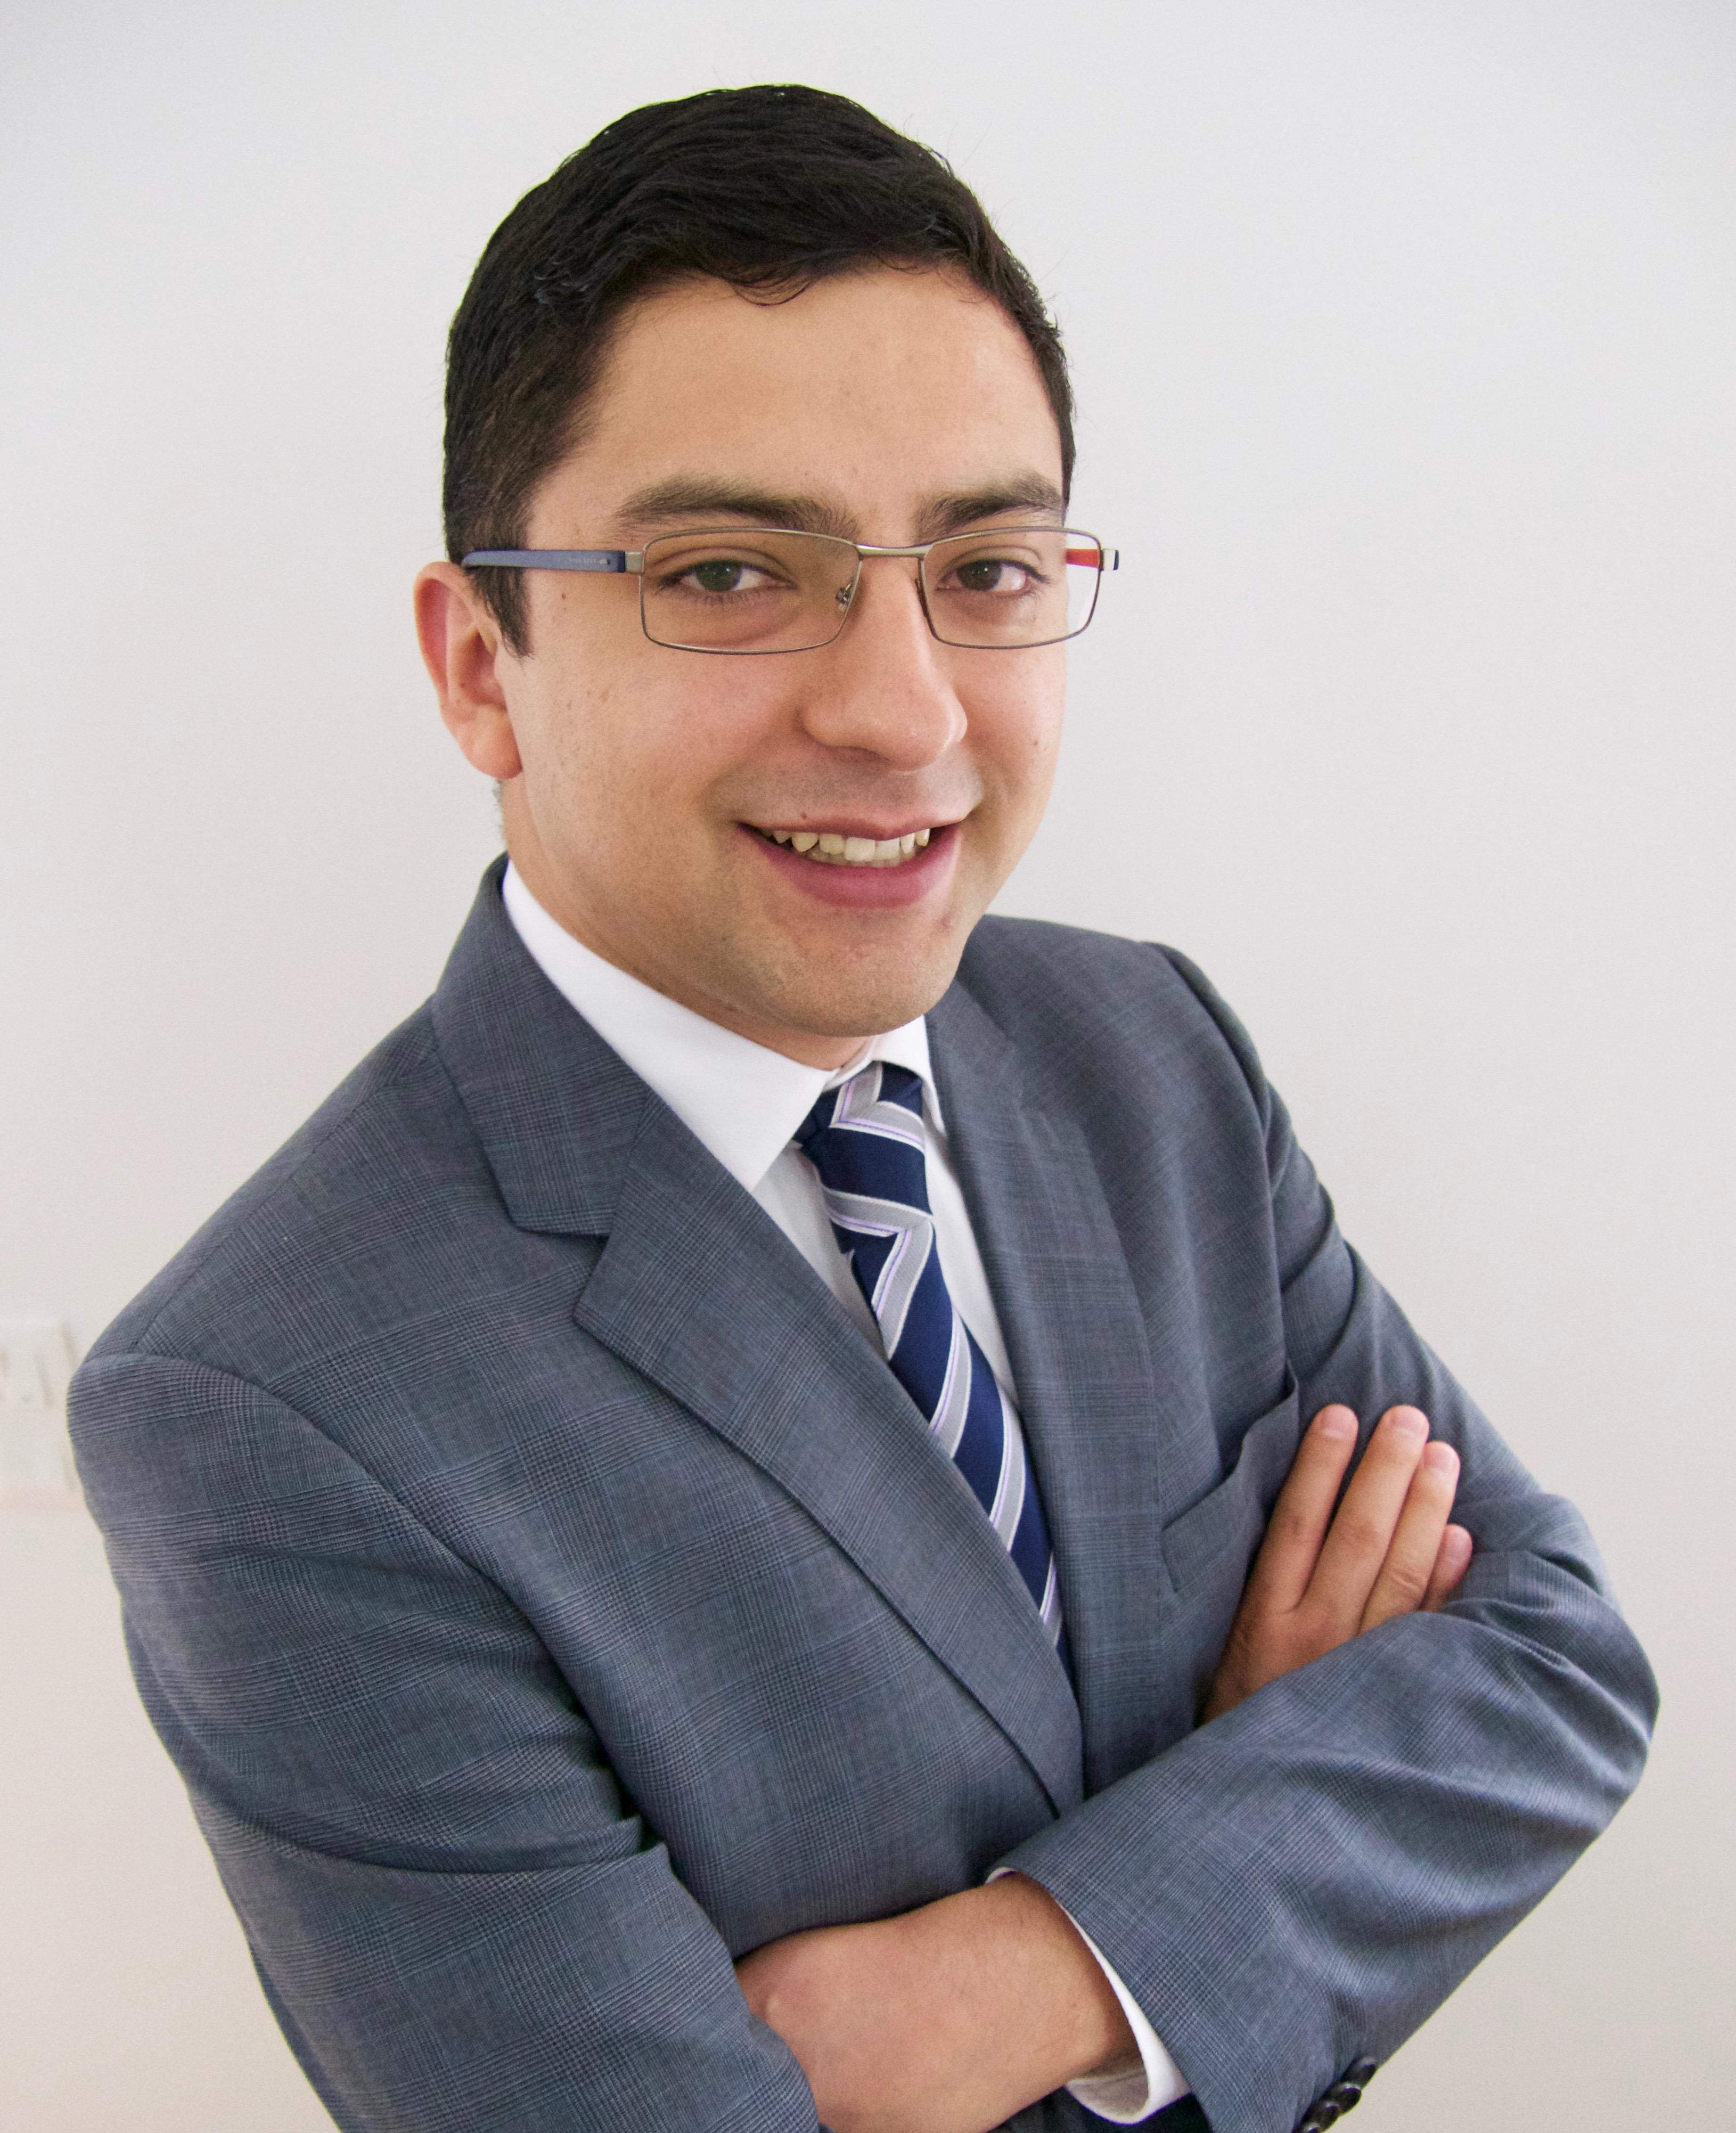 Alberto Tépox